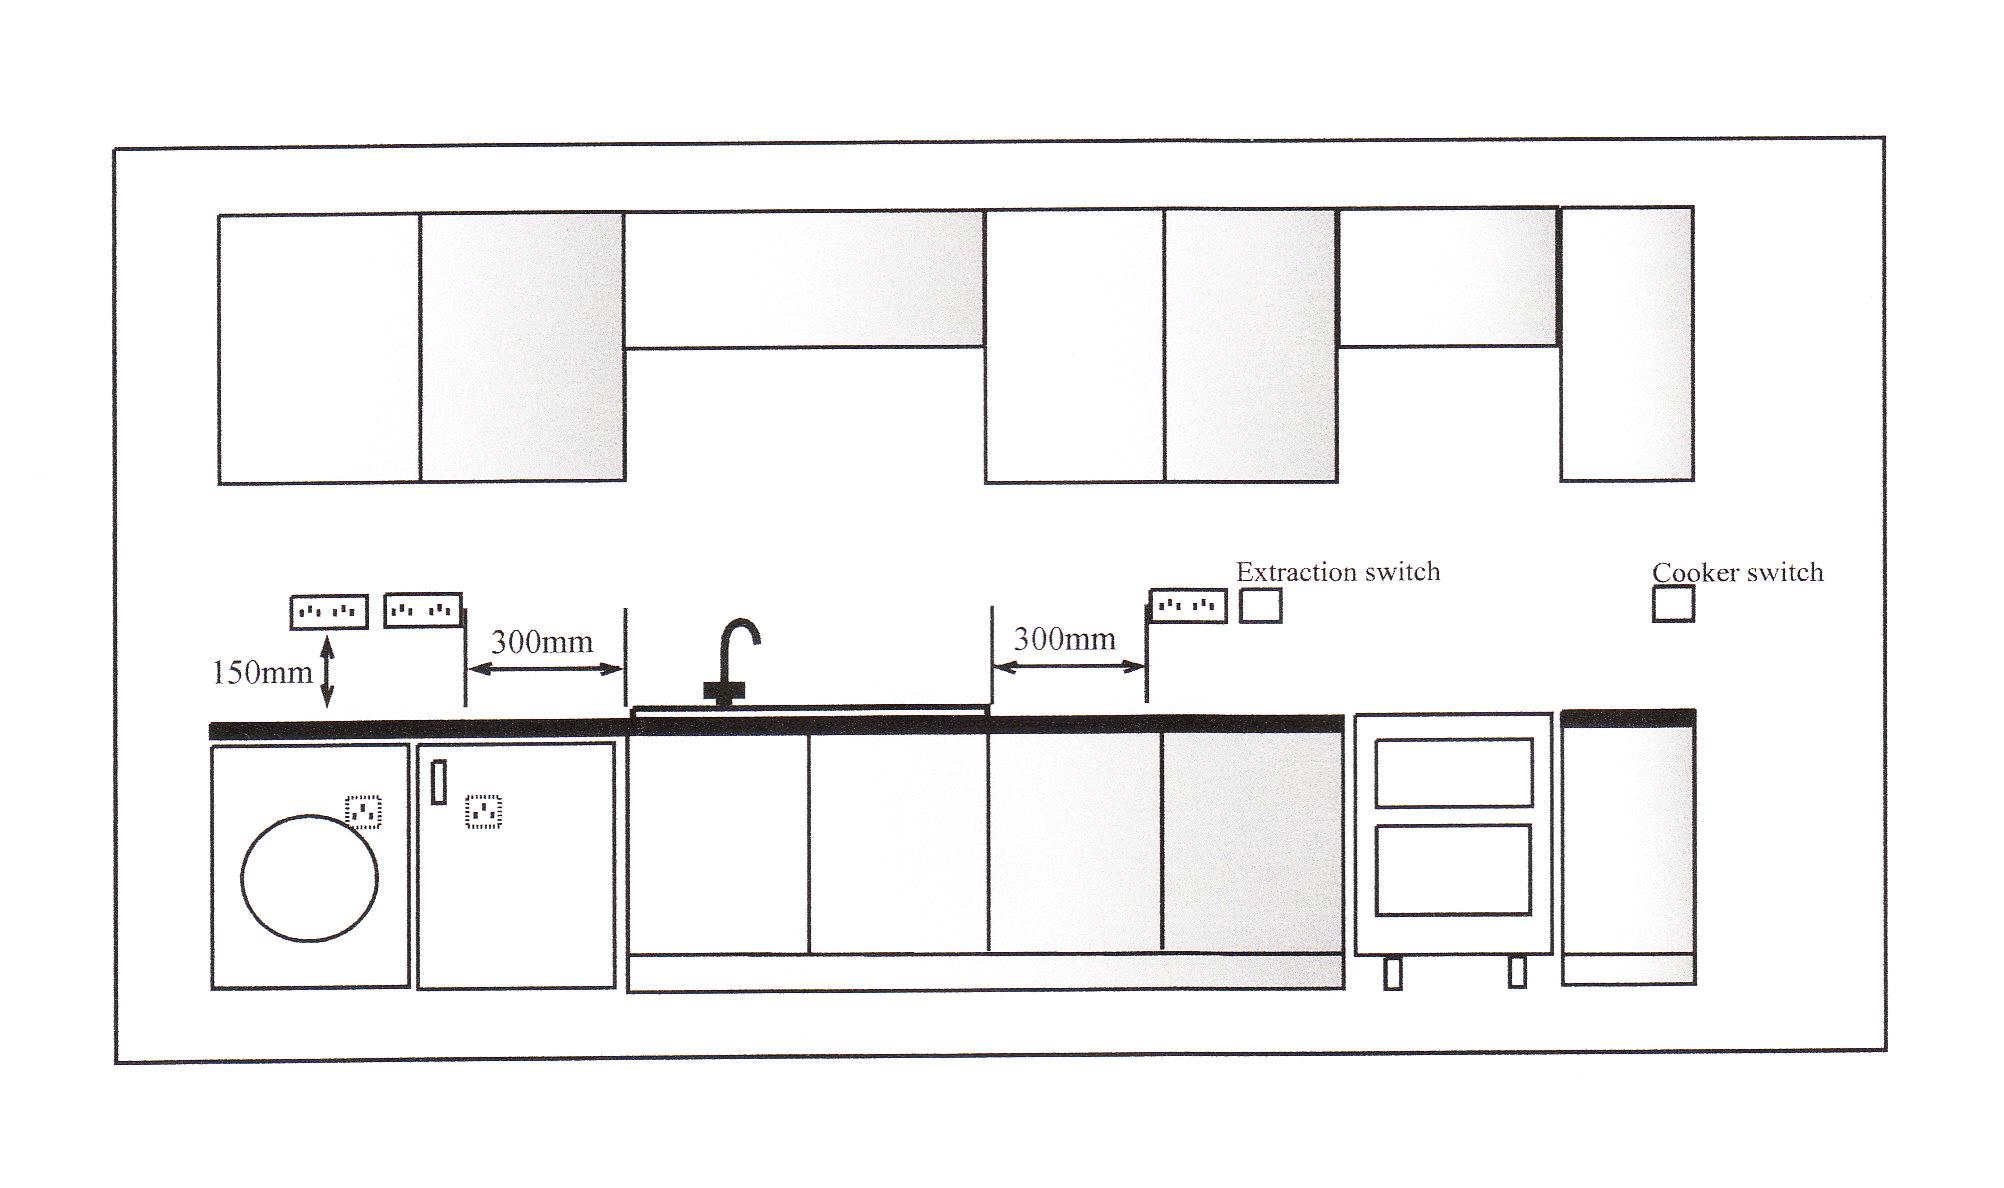 dishwasher air gap installation diagram shakespeare globe theatre labeled schematic get free image